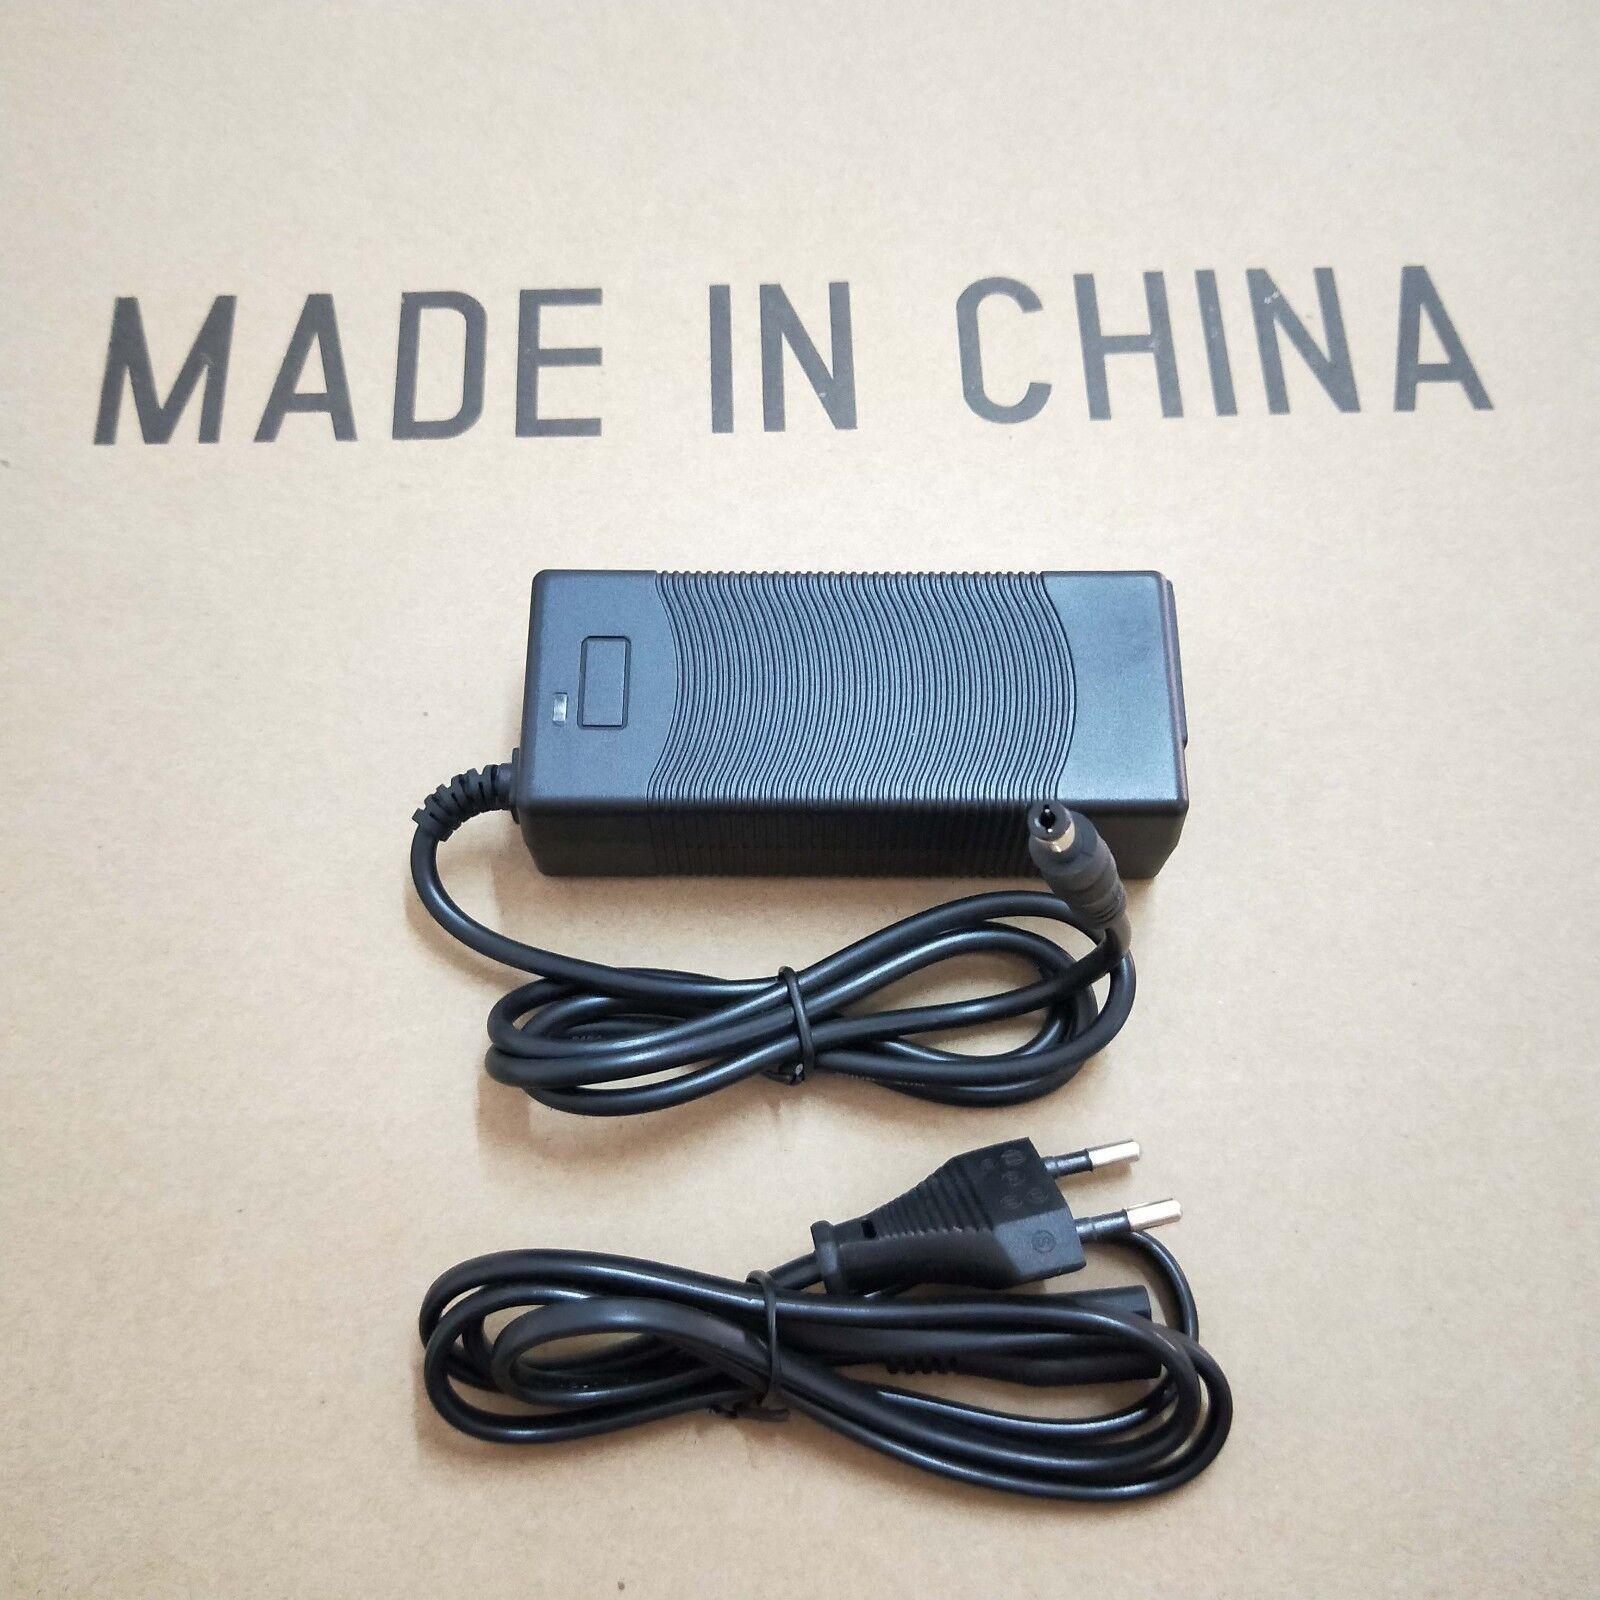 Smart Battery charger 7S Li-ion  charger 24V 2A 29.4V 2A with 2.1DC plug 110-220V  deals sale